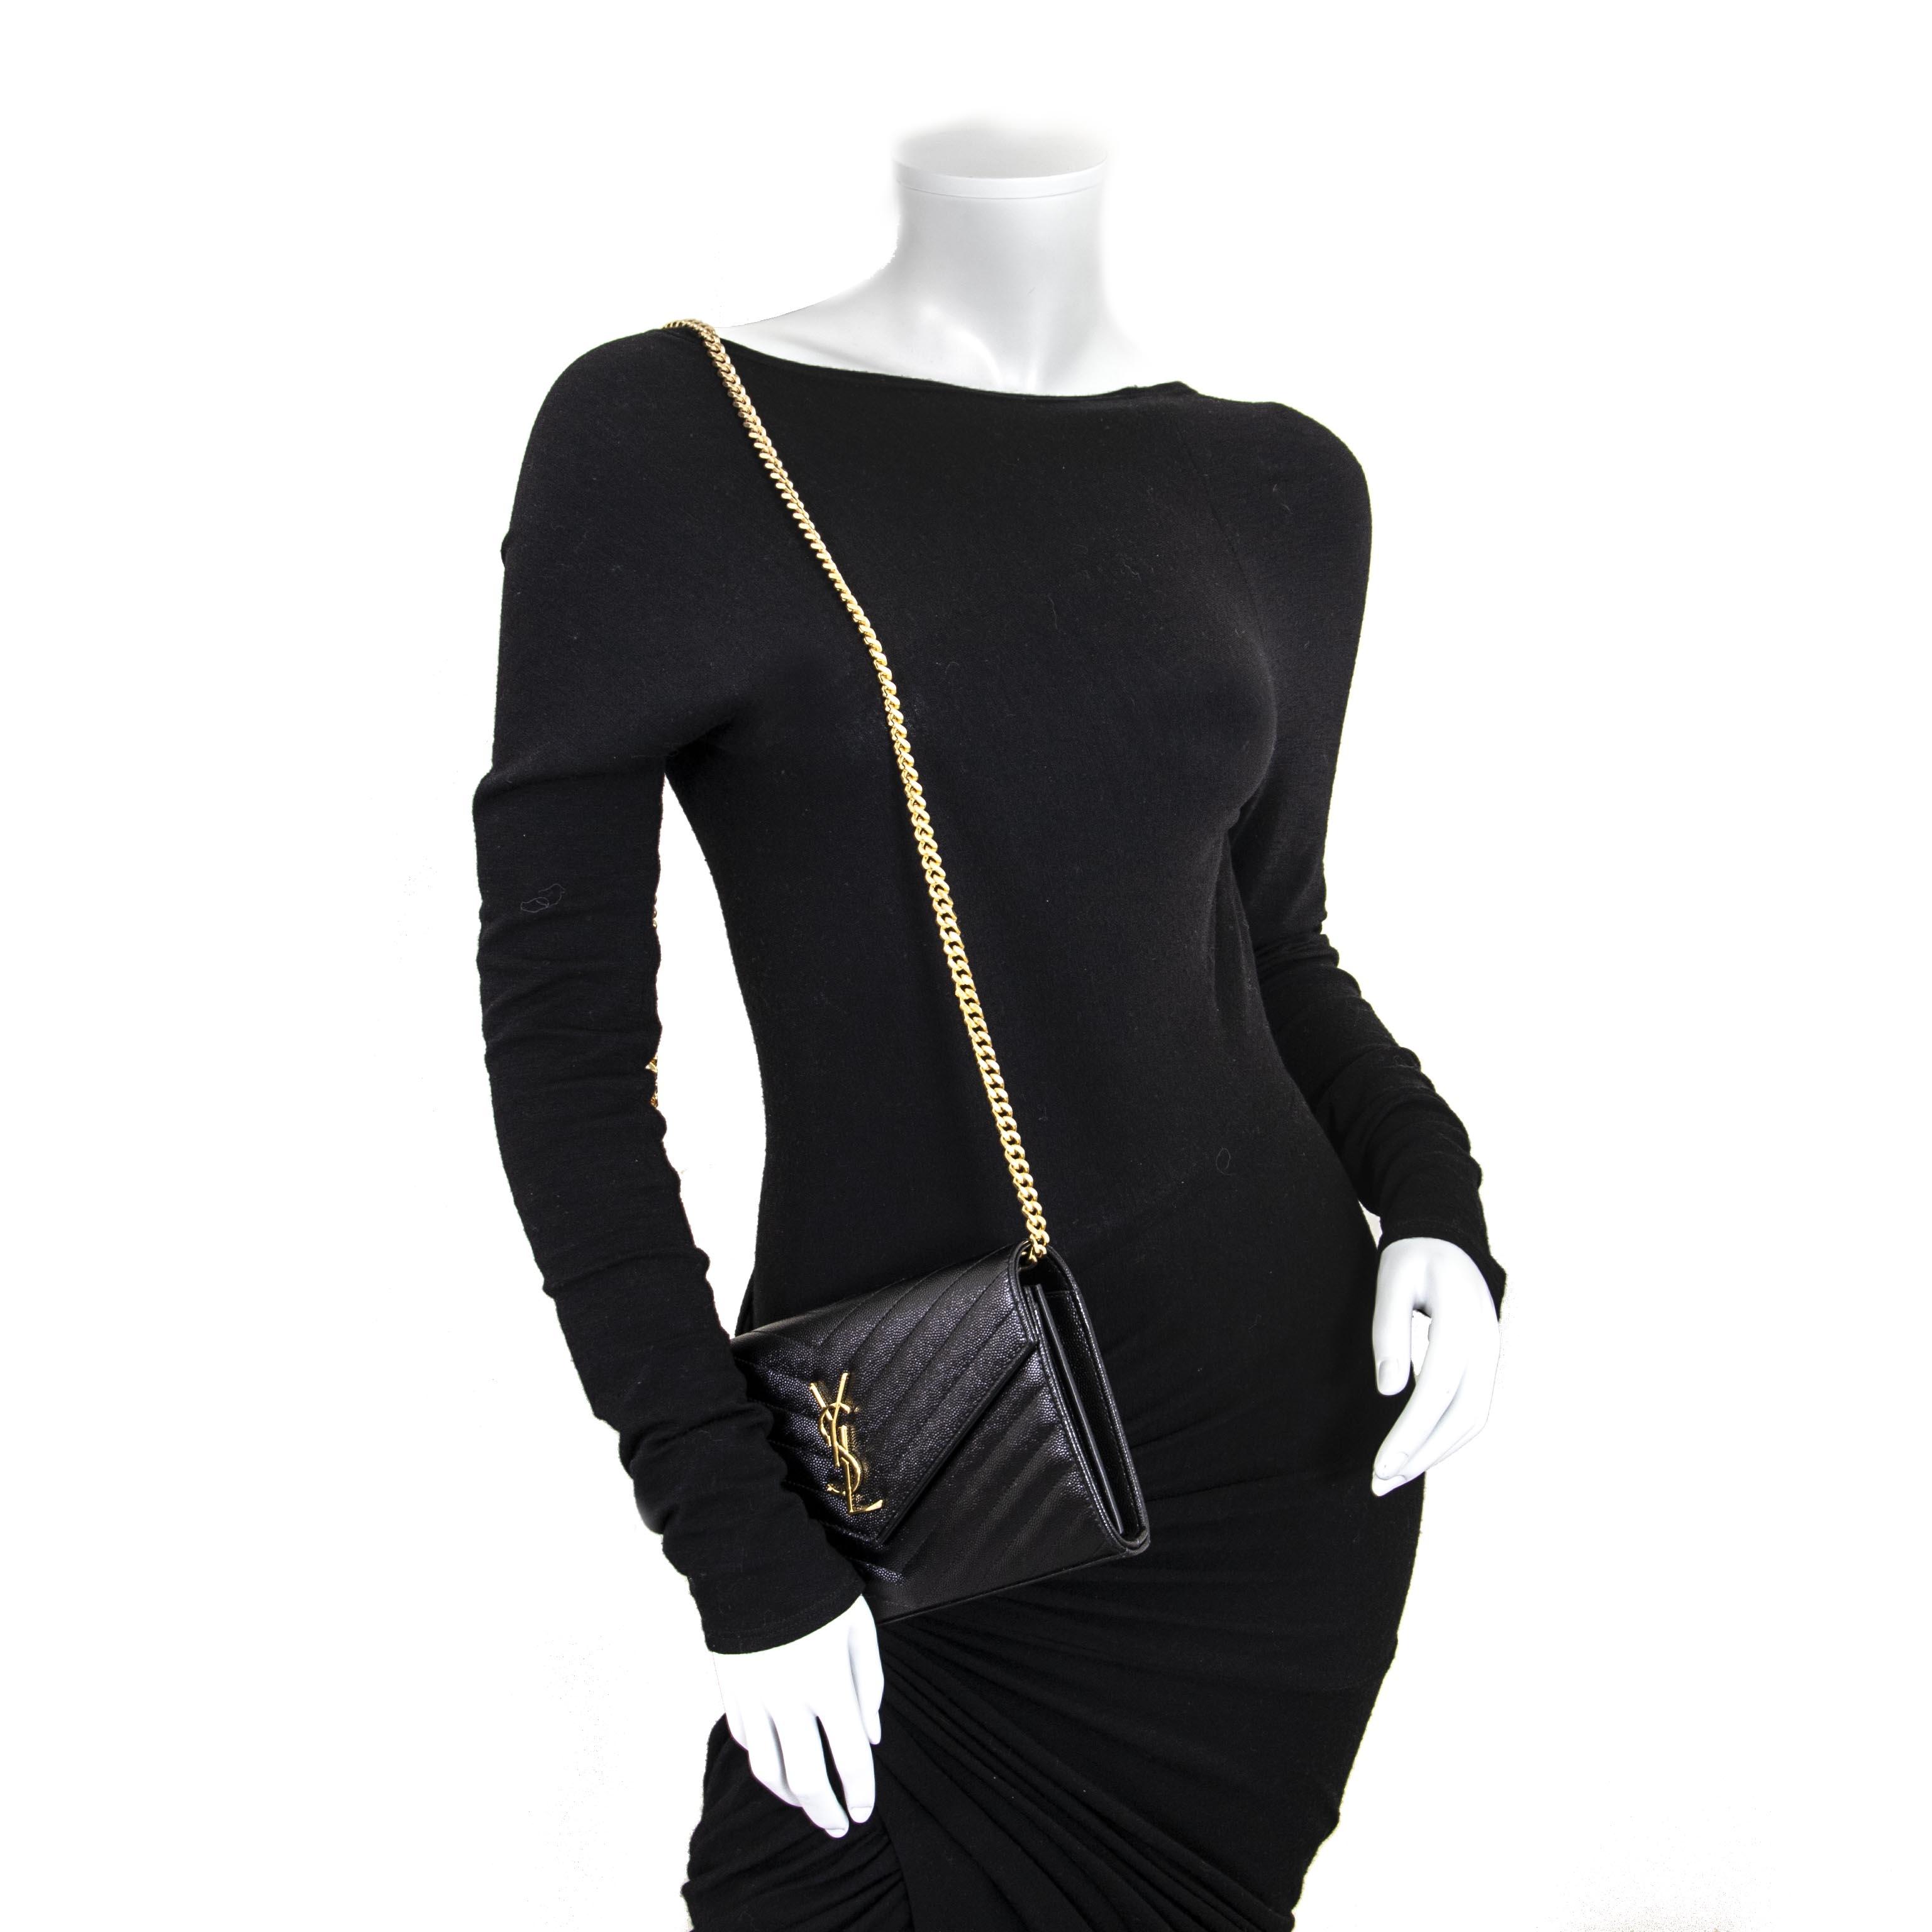 a422f521b33 ... Yves Saint Laurent Black Quilted Wallet On A Chain nu te koop bij  labellov vintage webshop